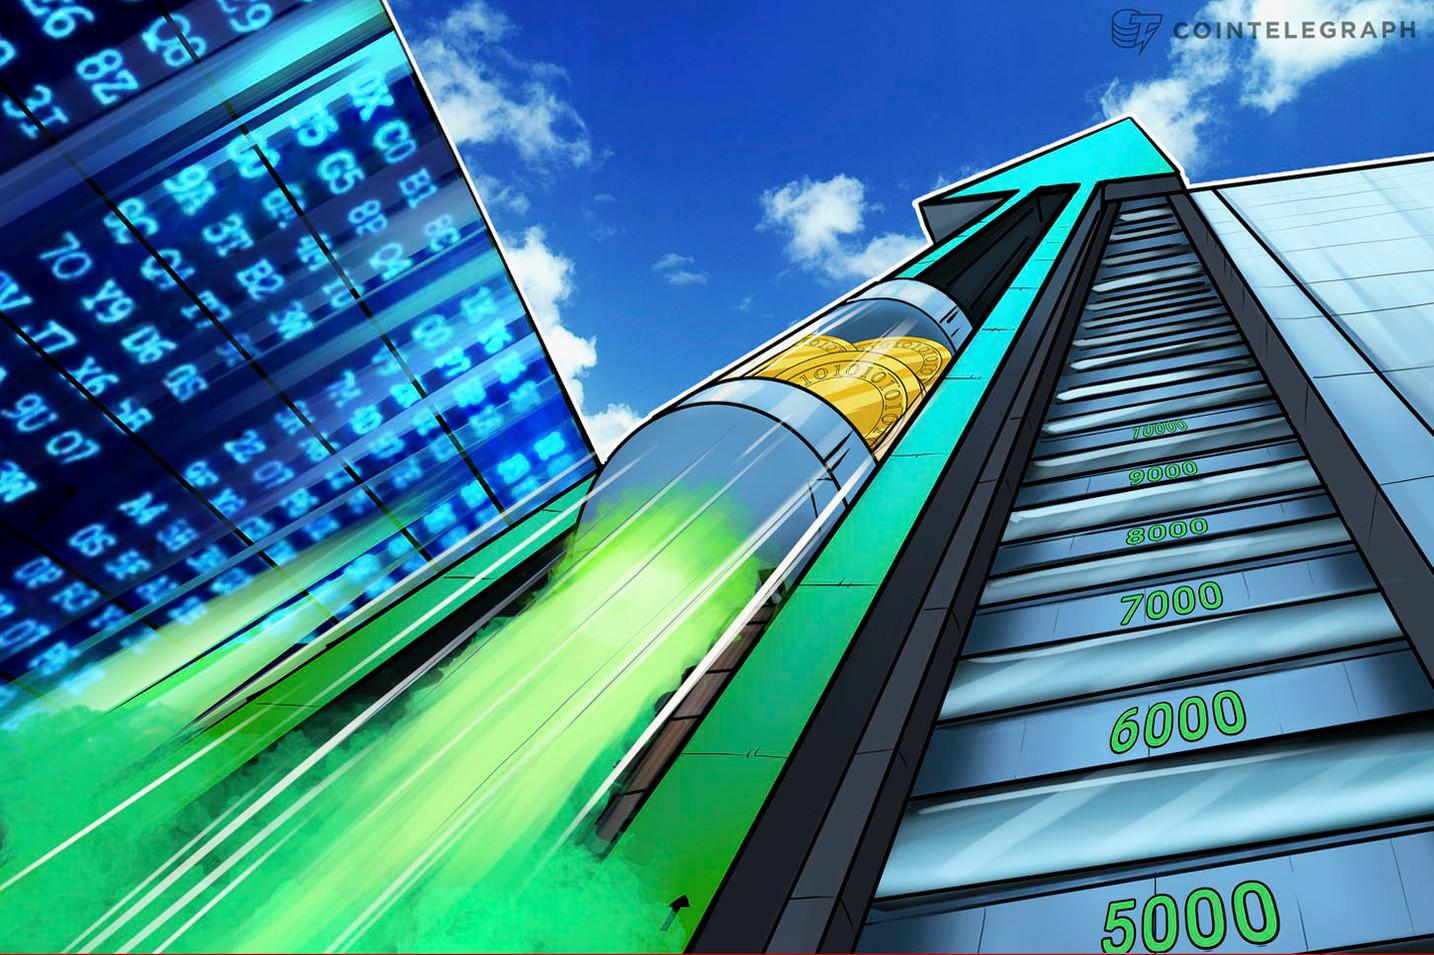 Bitcoin, Ethereum, Bitcoin Cash, Ripple, Stellar, Litecoin, Cardano, NEO, EOS: Analisi dei prezzi, 13 aprile